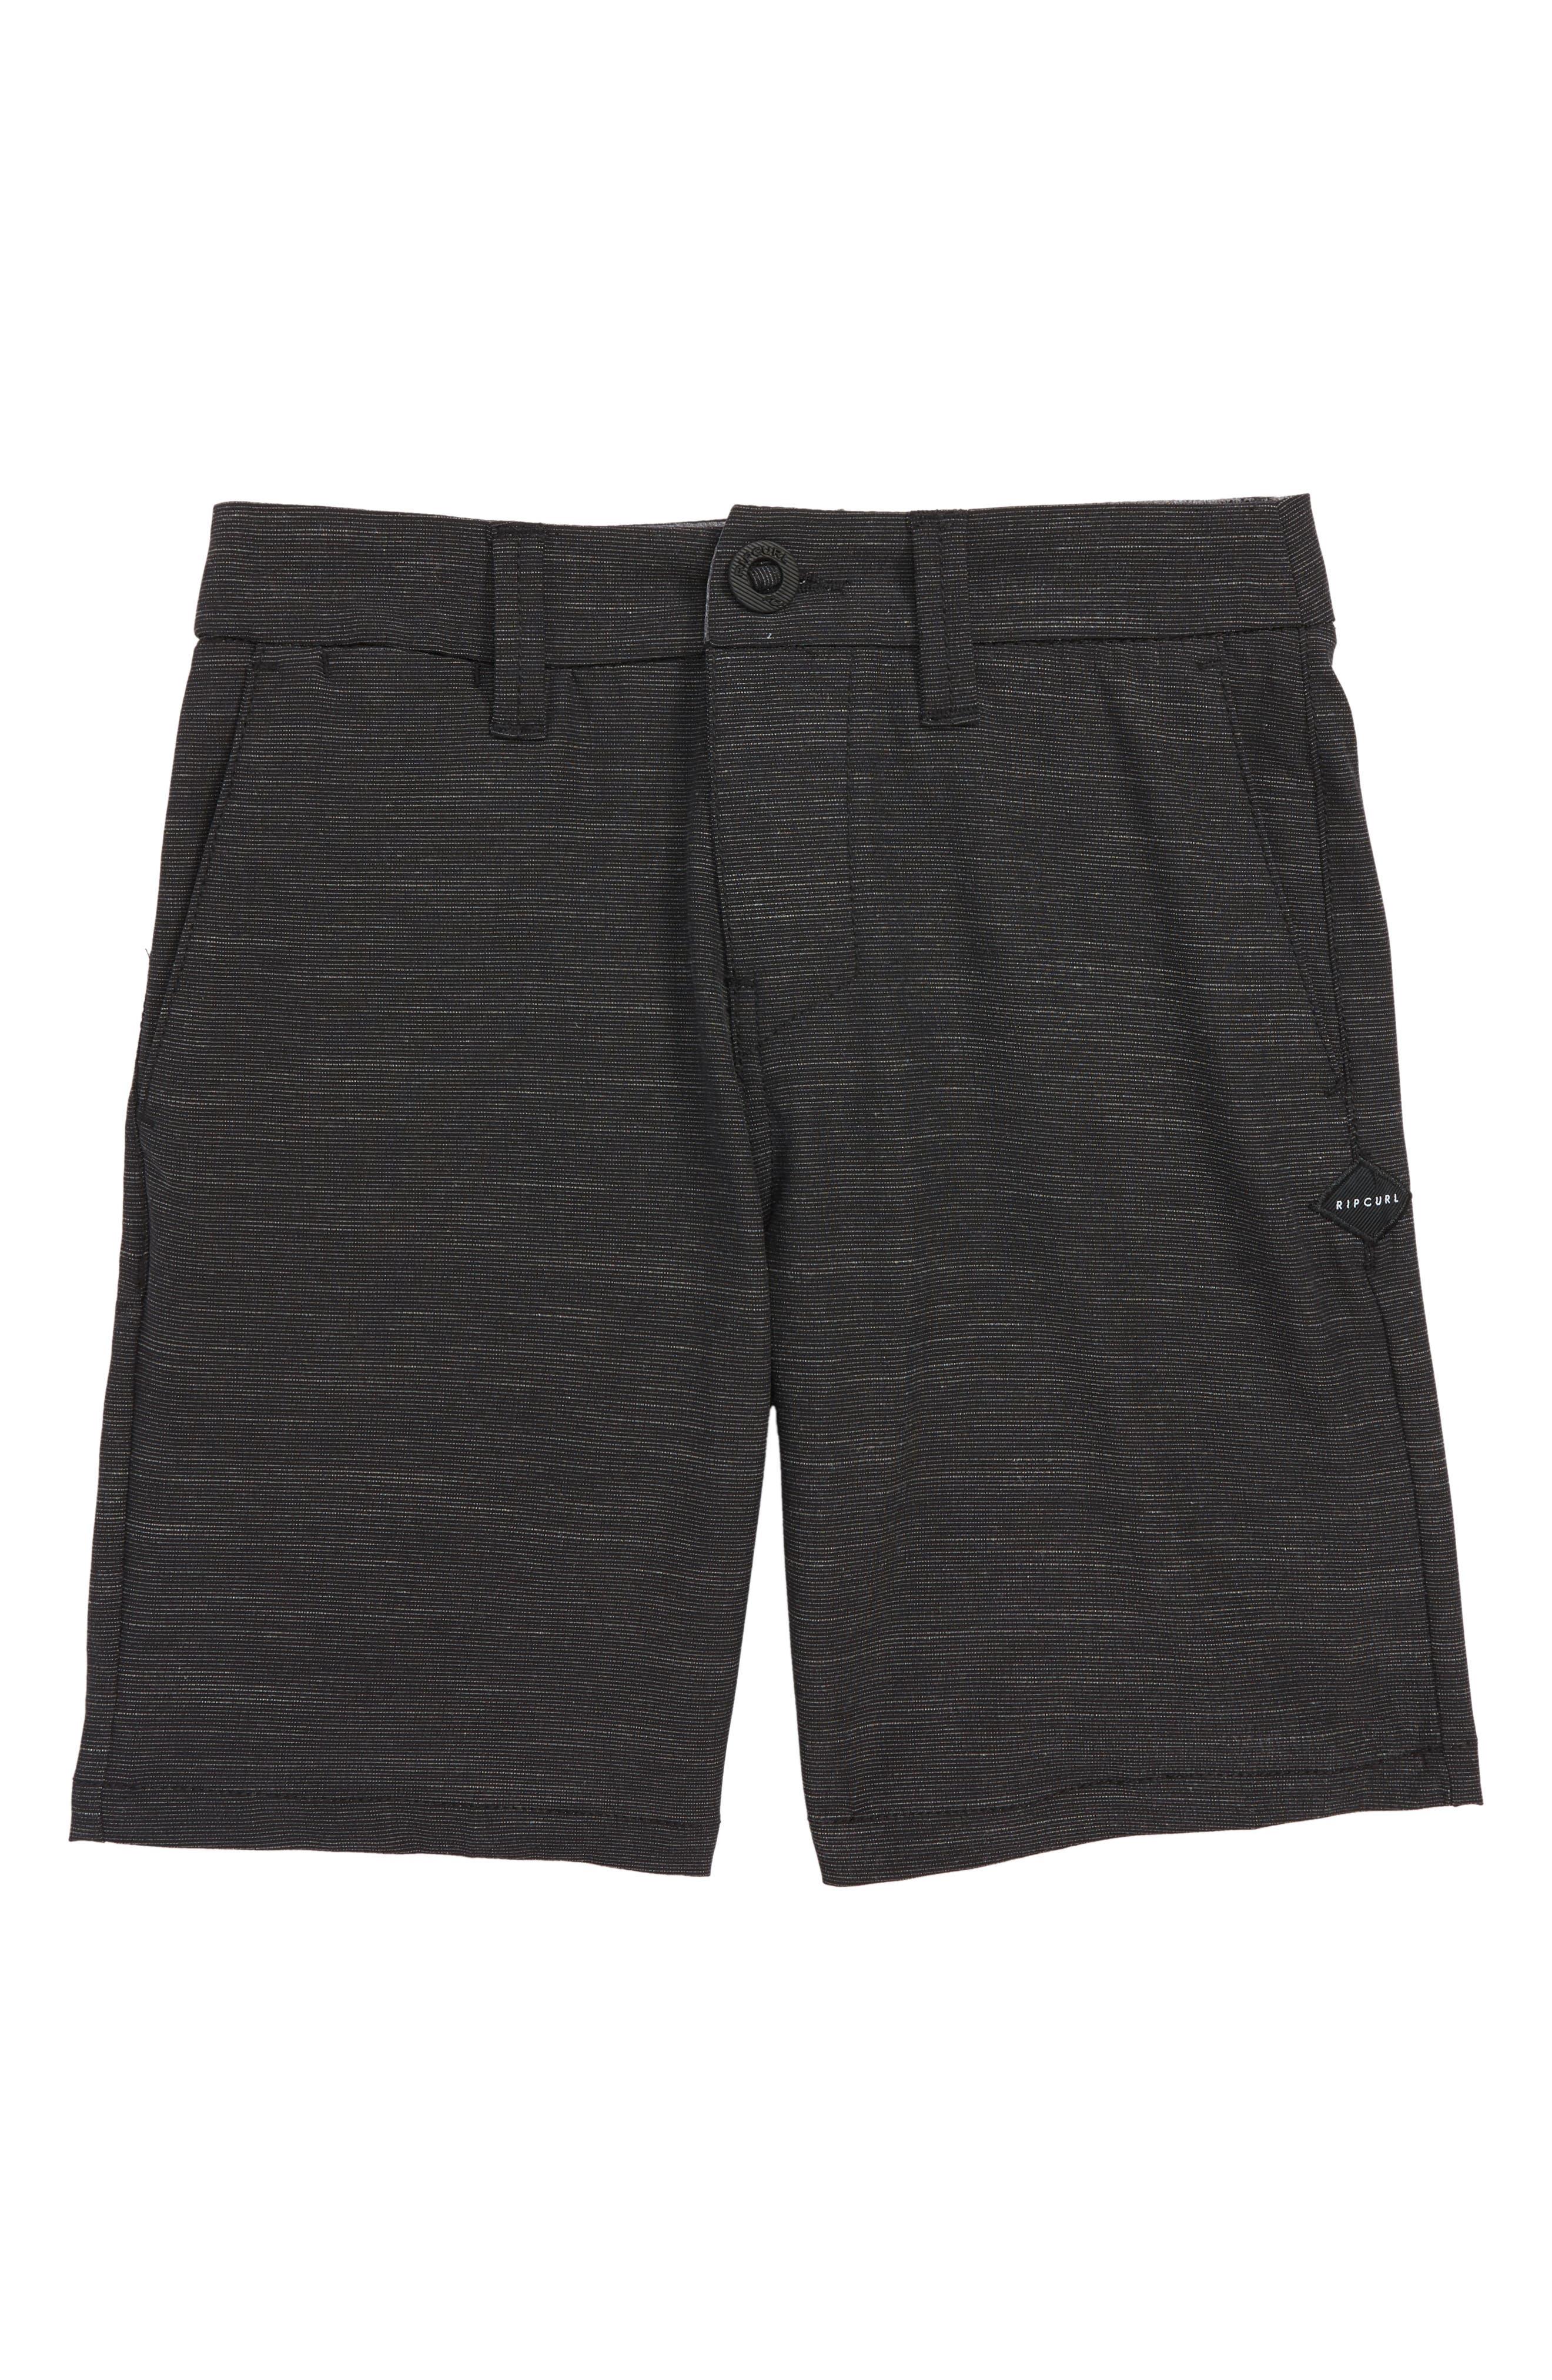 Mirage Jackson Boardwalk Board Shorts,                             Main thumbnail 1, color,                             001